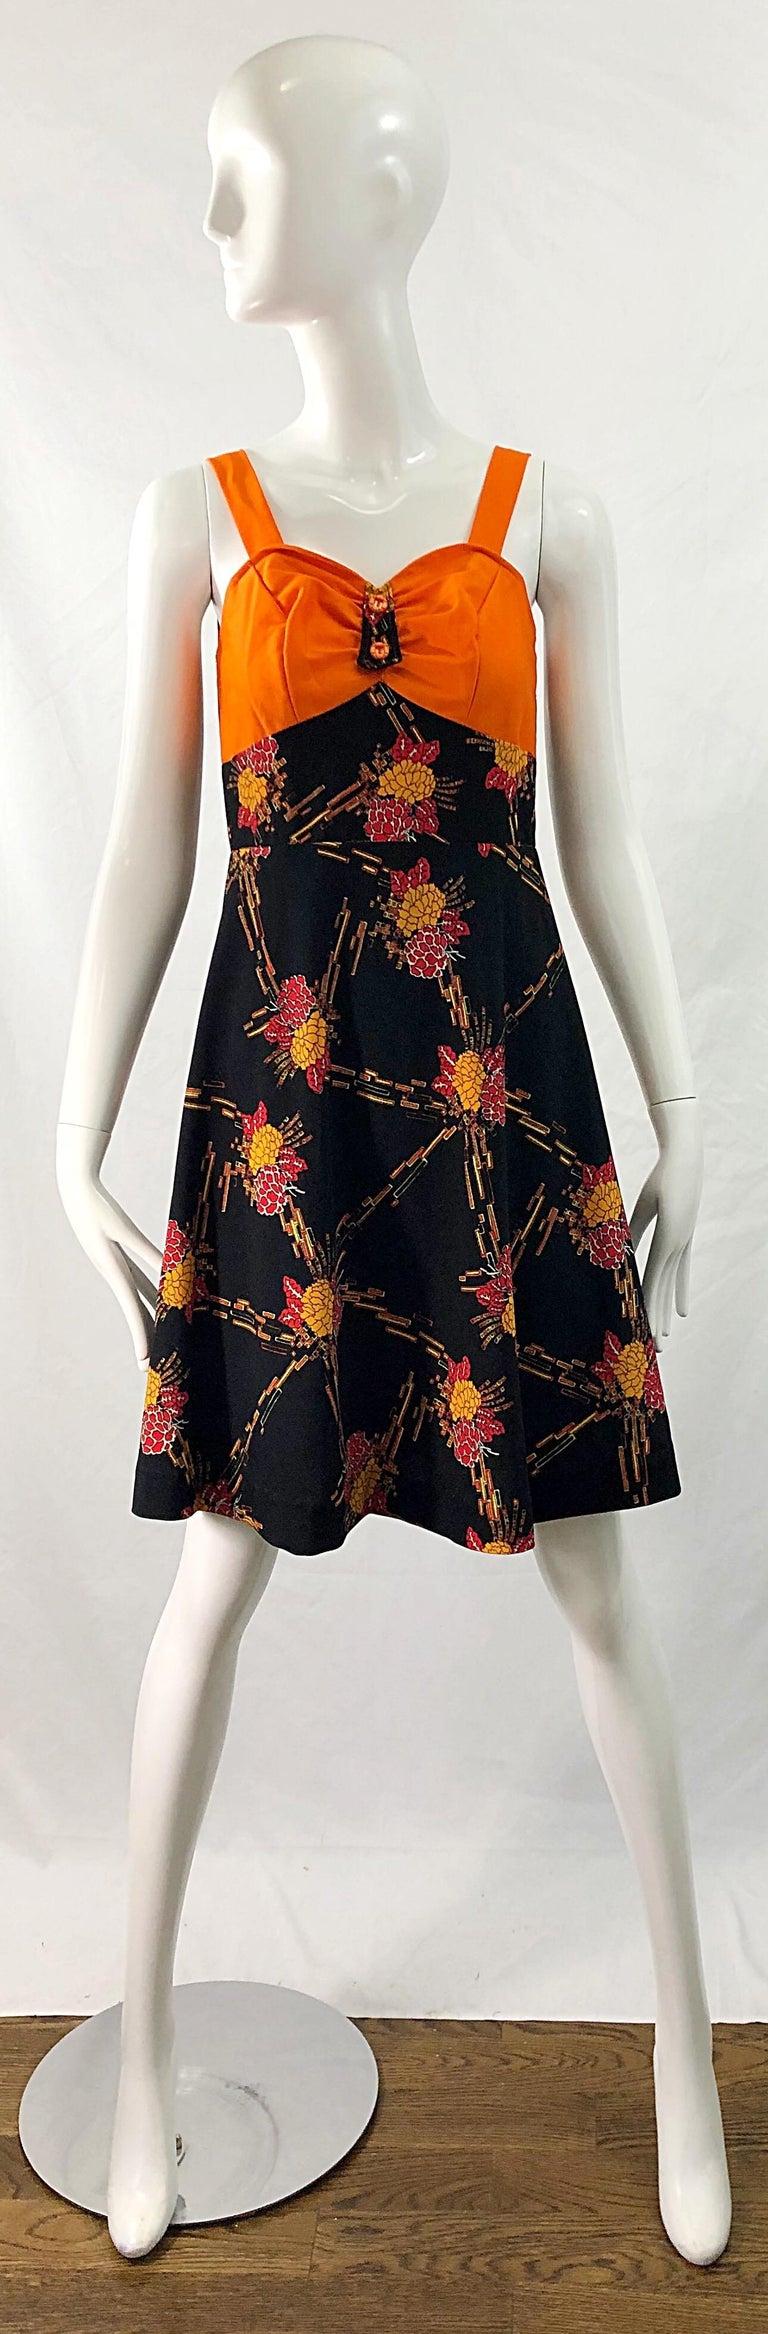 Black 1970s Autumnal Digital Floral Print Knit Vintage 70s A Line Dress + Bolero Top For Sale